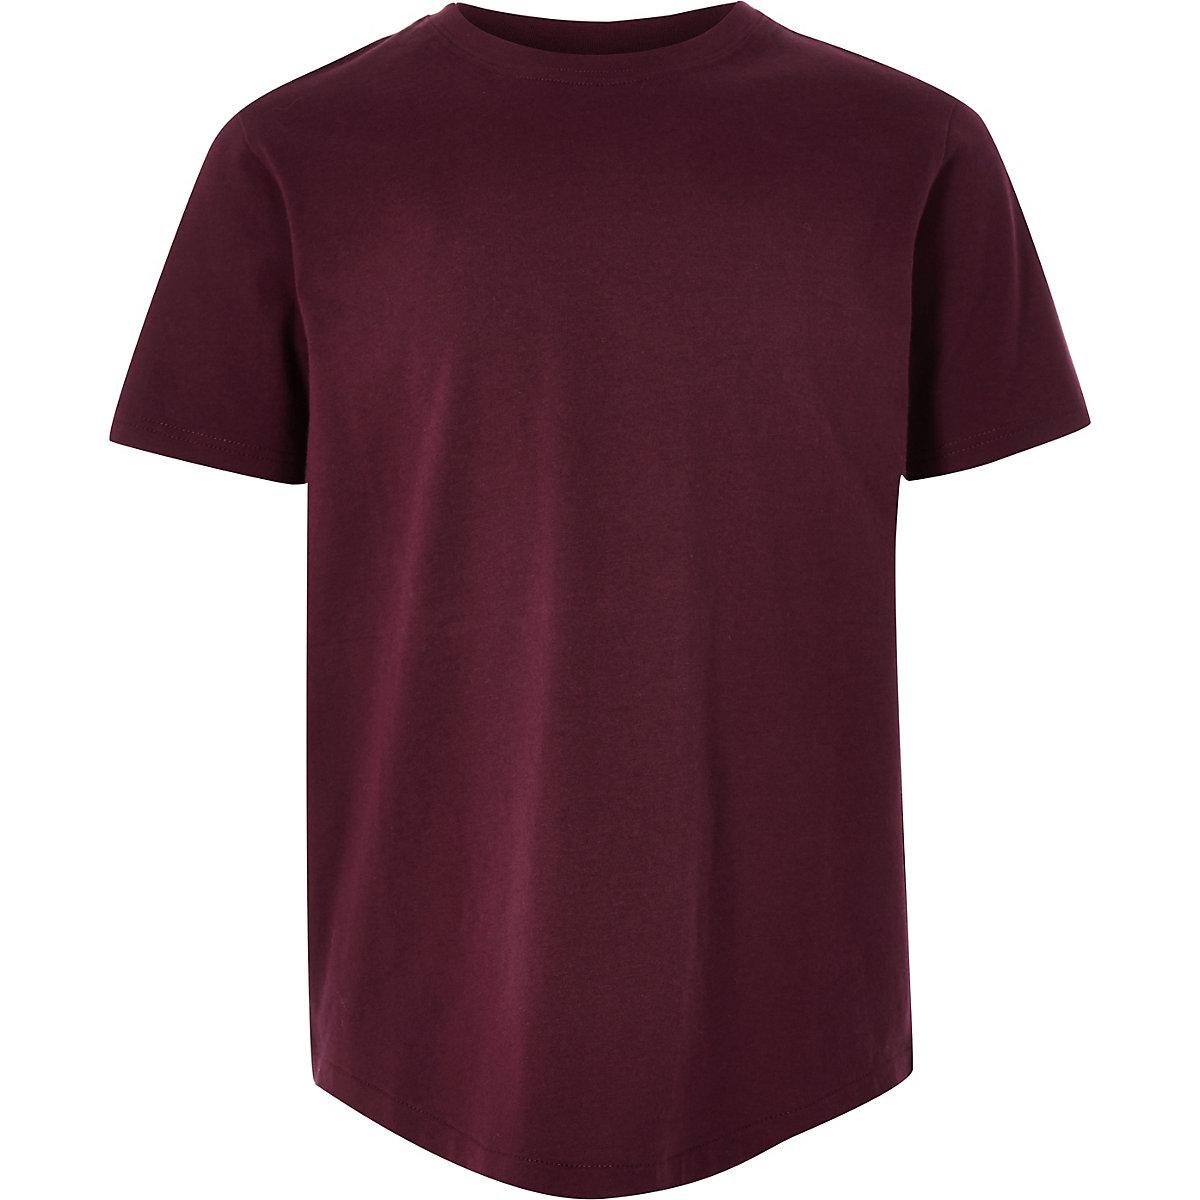 Boys burgundy short sleeve T-shirt